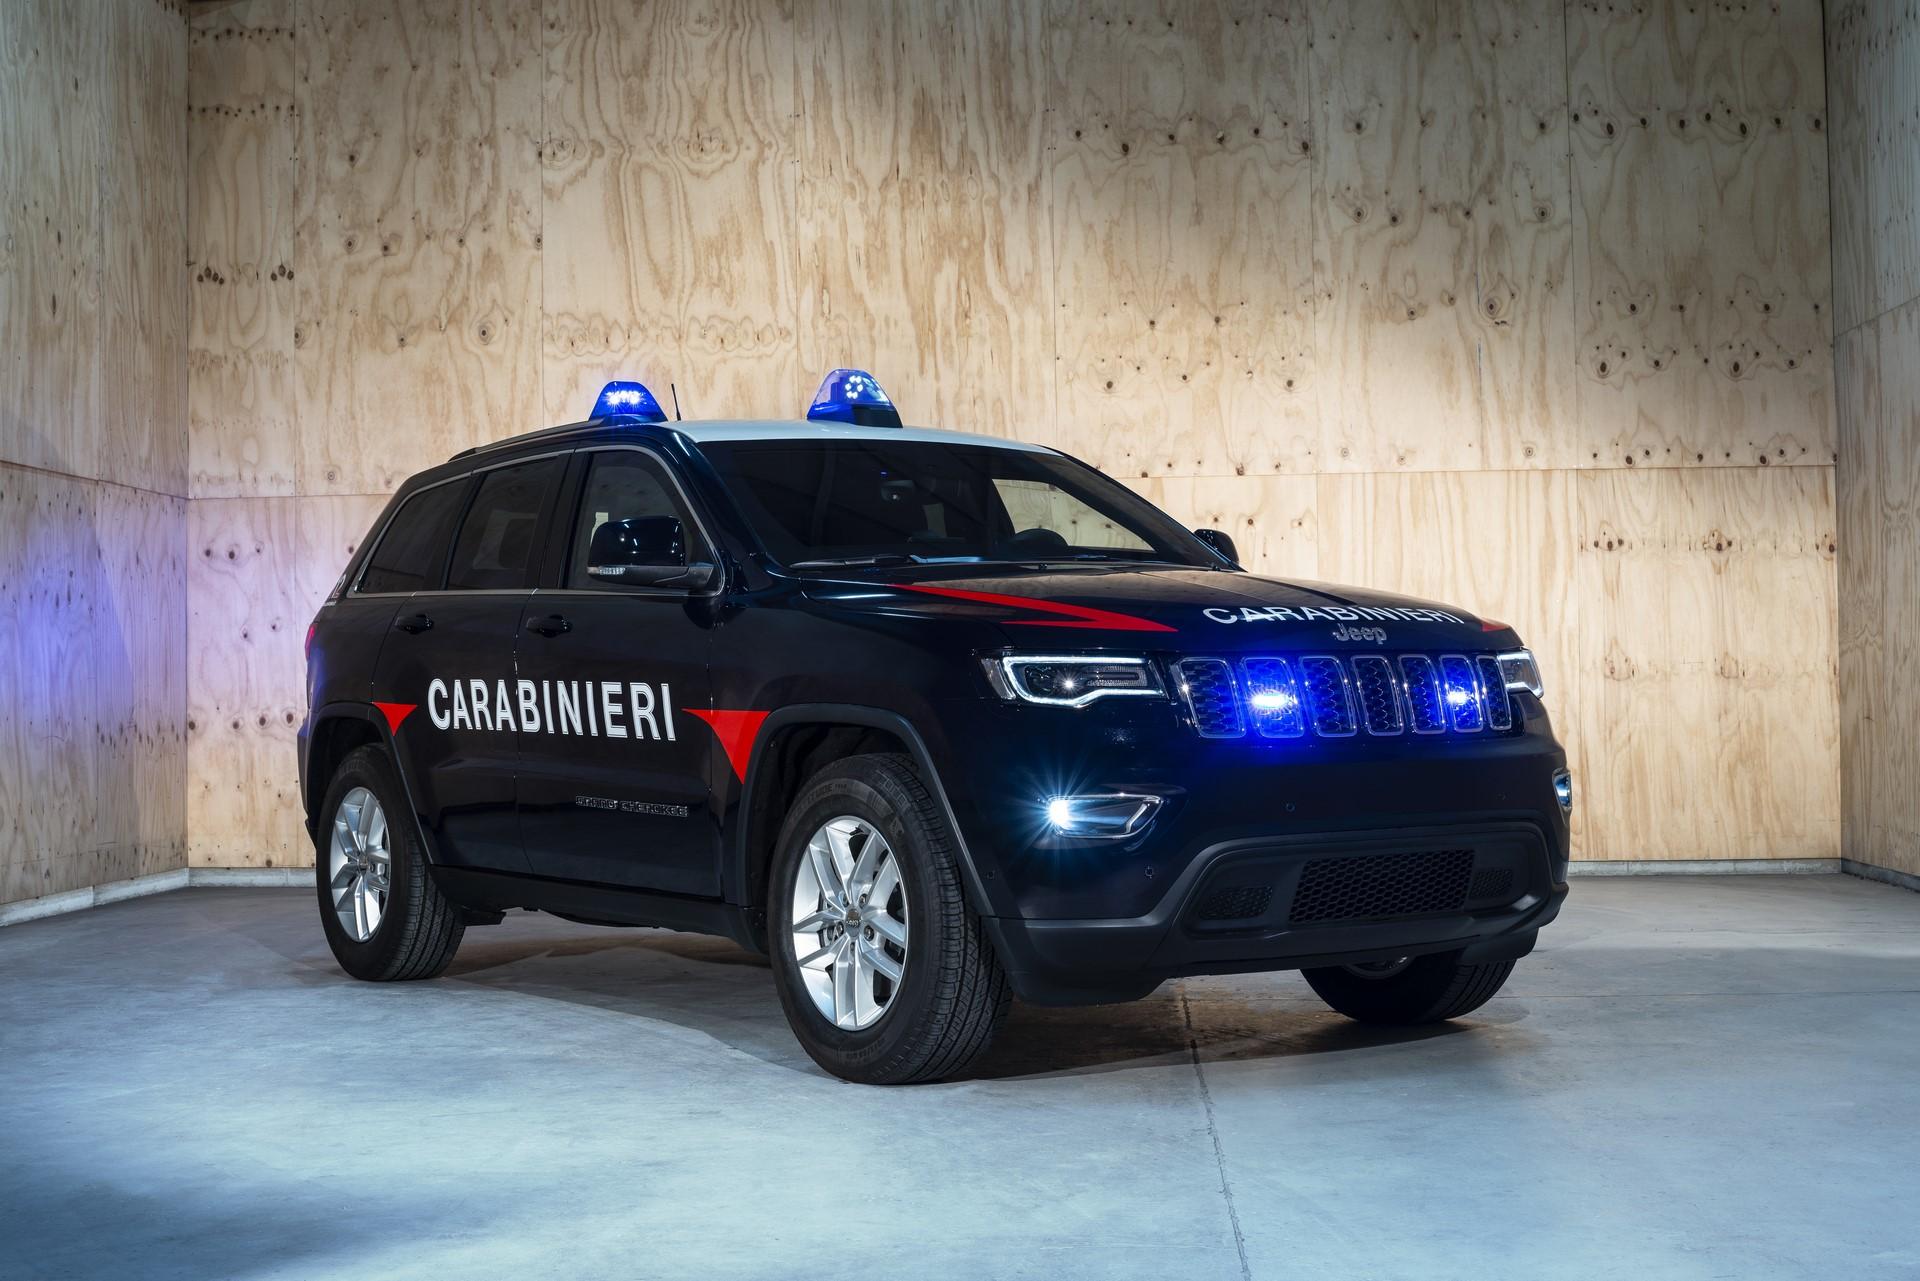 Jeep Grand Cherokee Carabinieri (3)